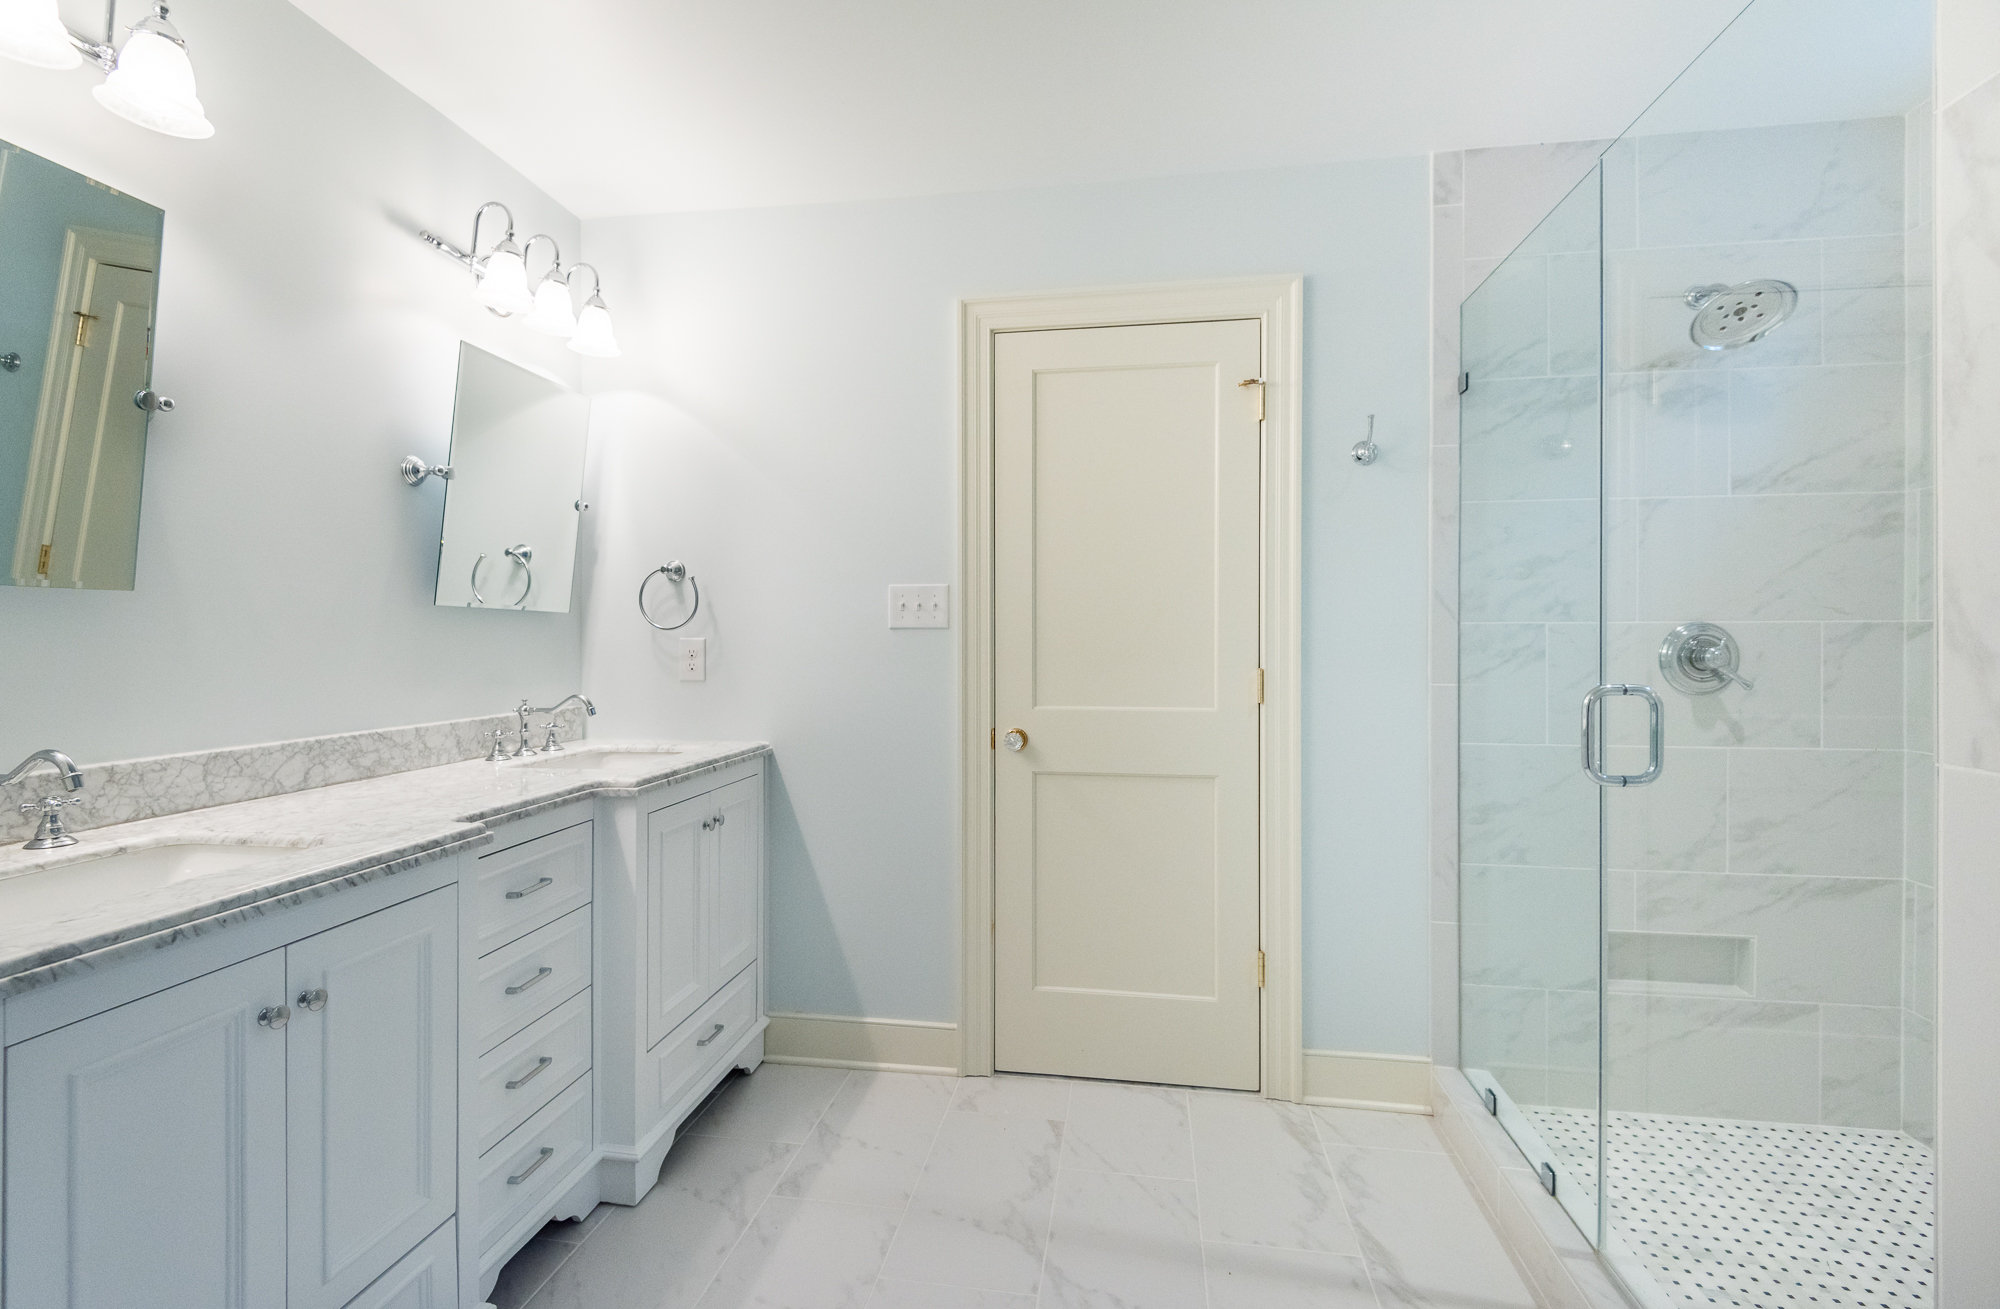 Bathroom remodeling richmond va kitchen remodeling for Bathroom remodel richmond va